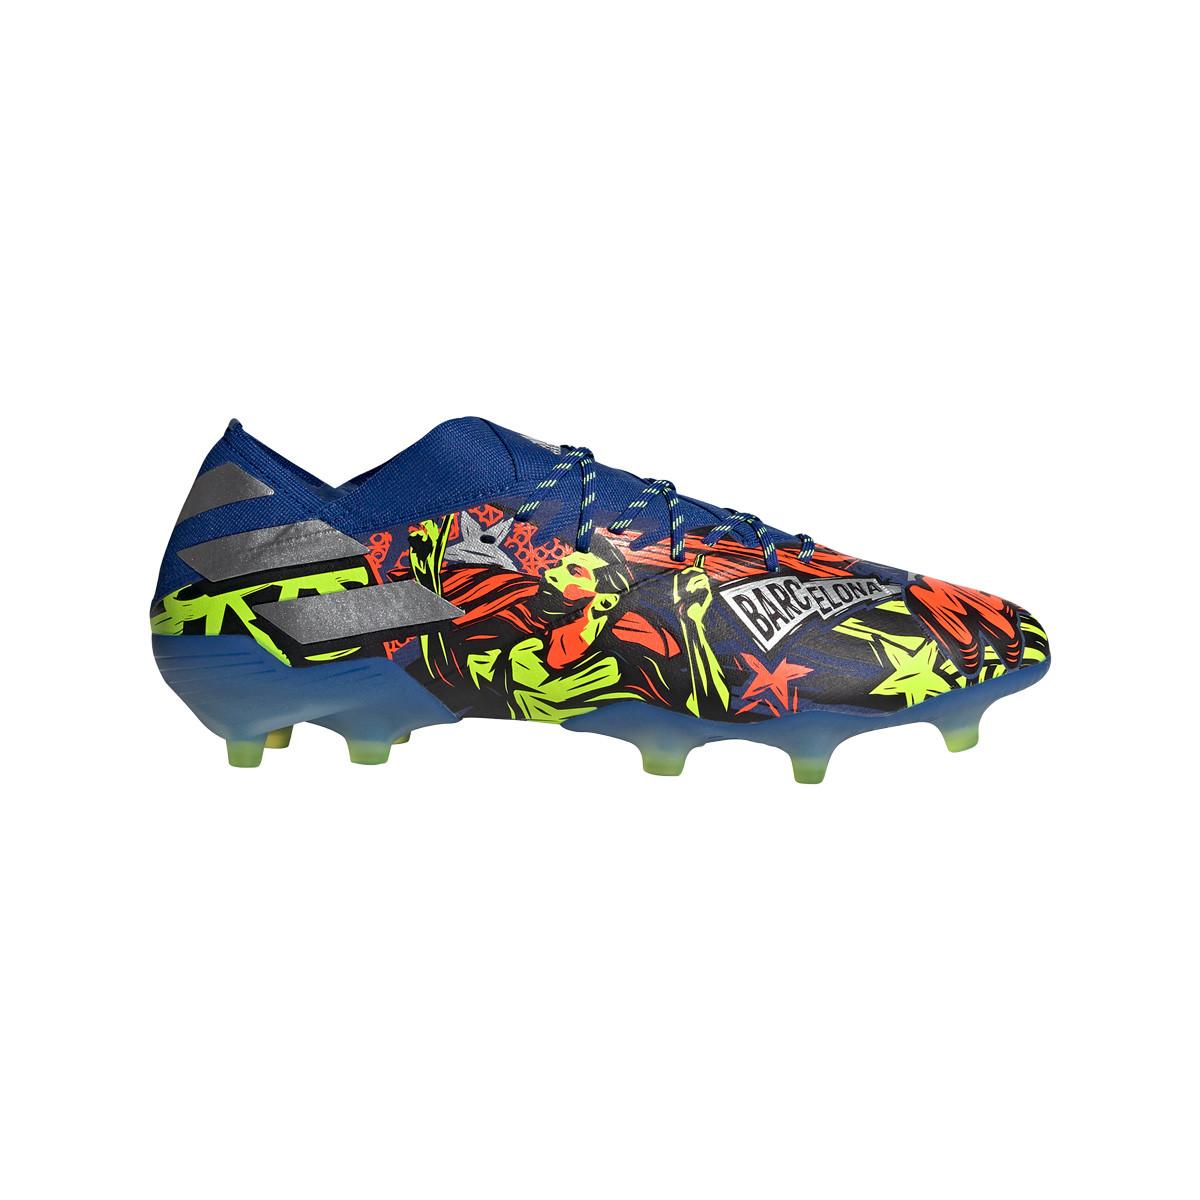 Football Boots adidas Nemeziz Messi 19